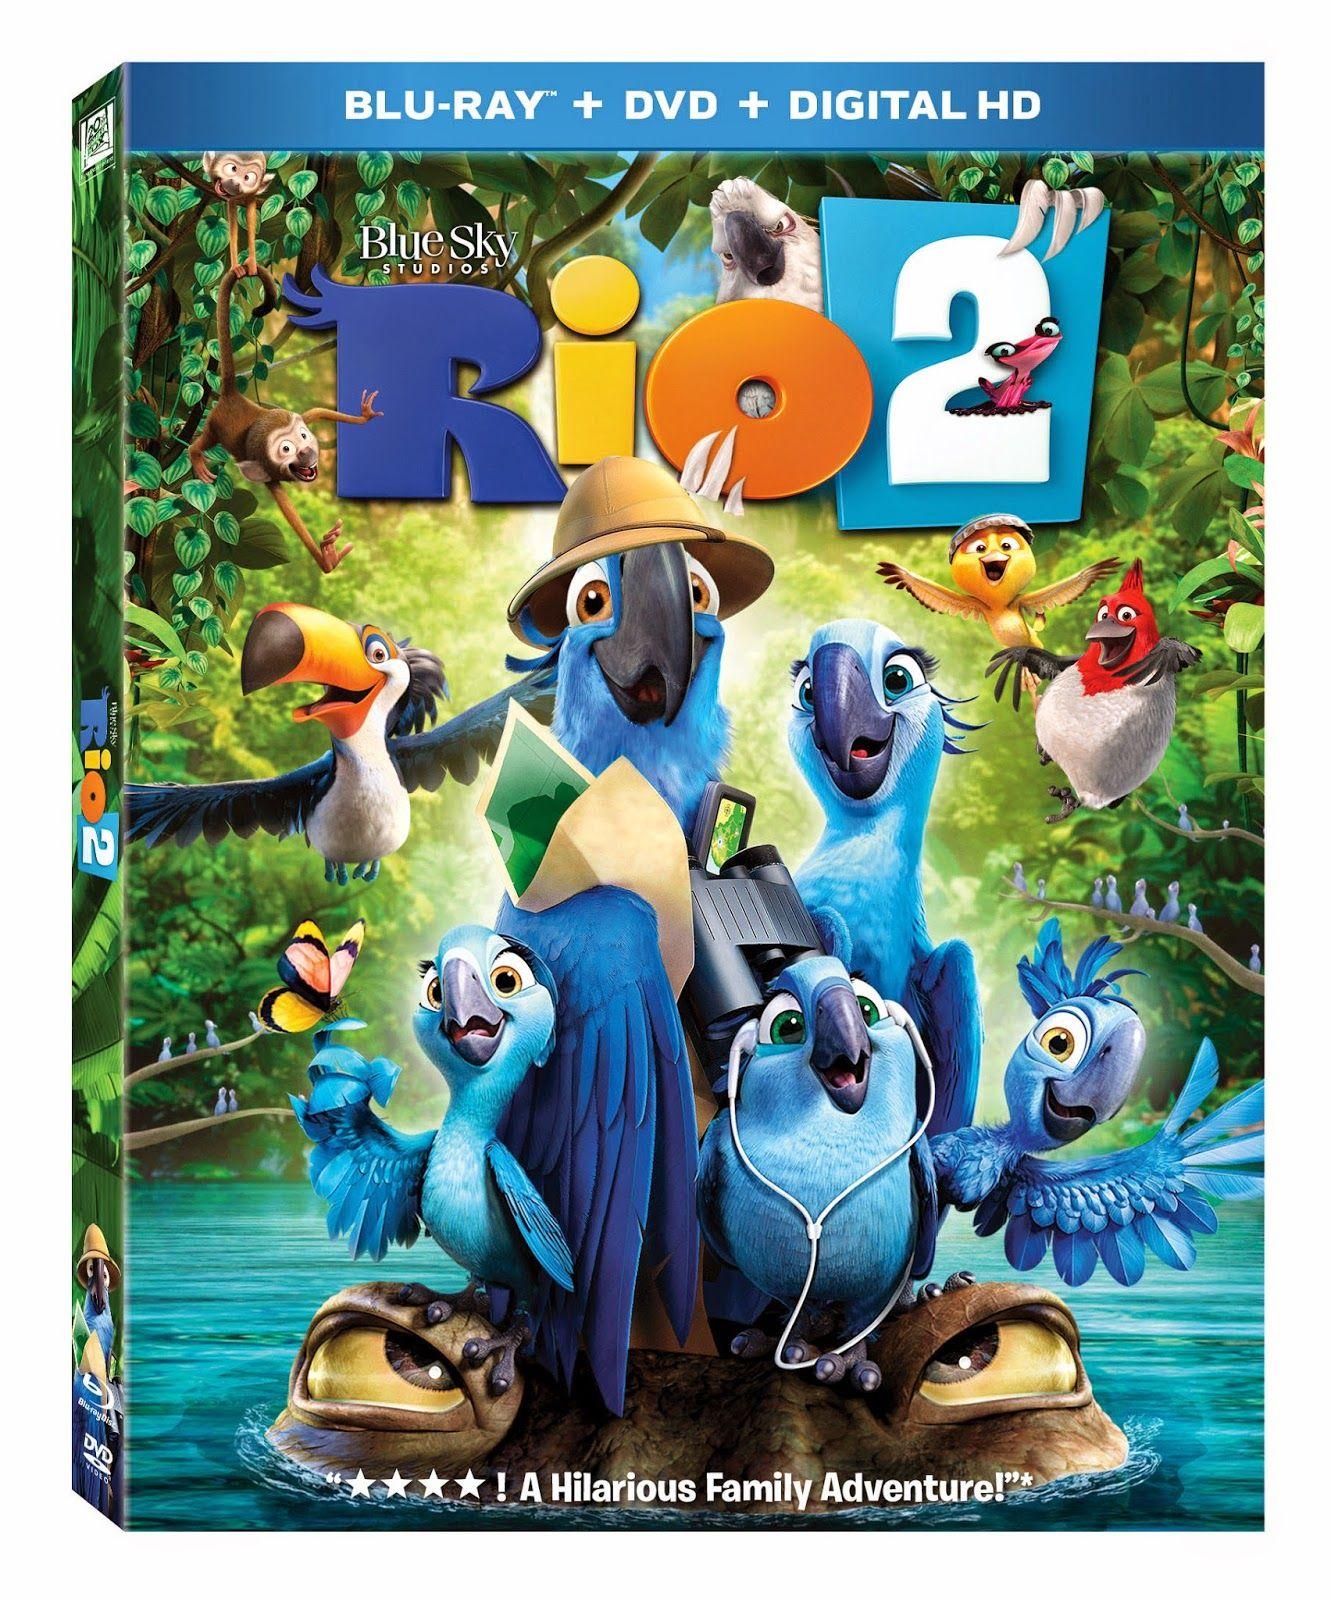 Biggest Party Of The Summer Rio 2 Rio Movie Rio 2 Movie Rio 2